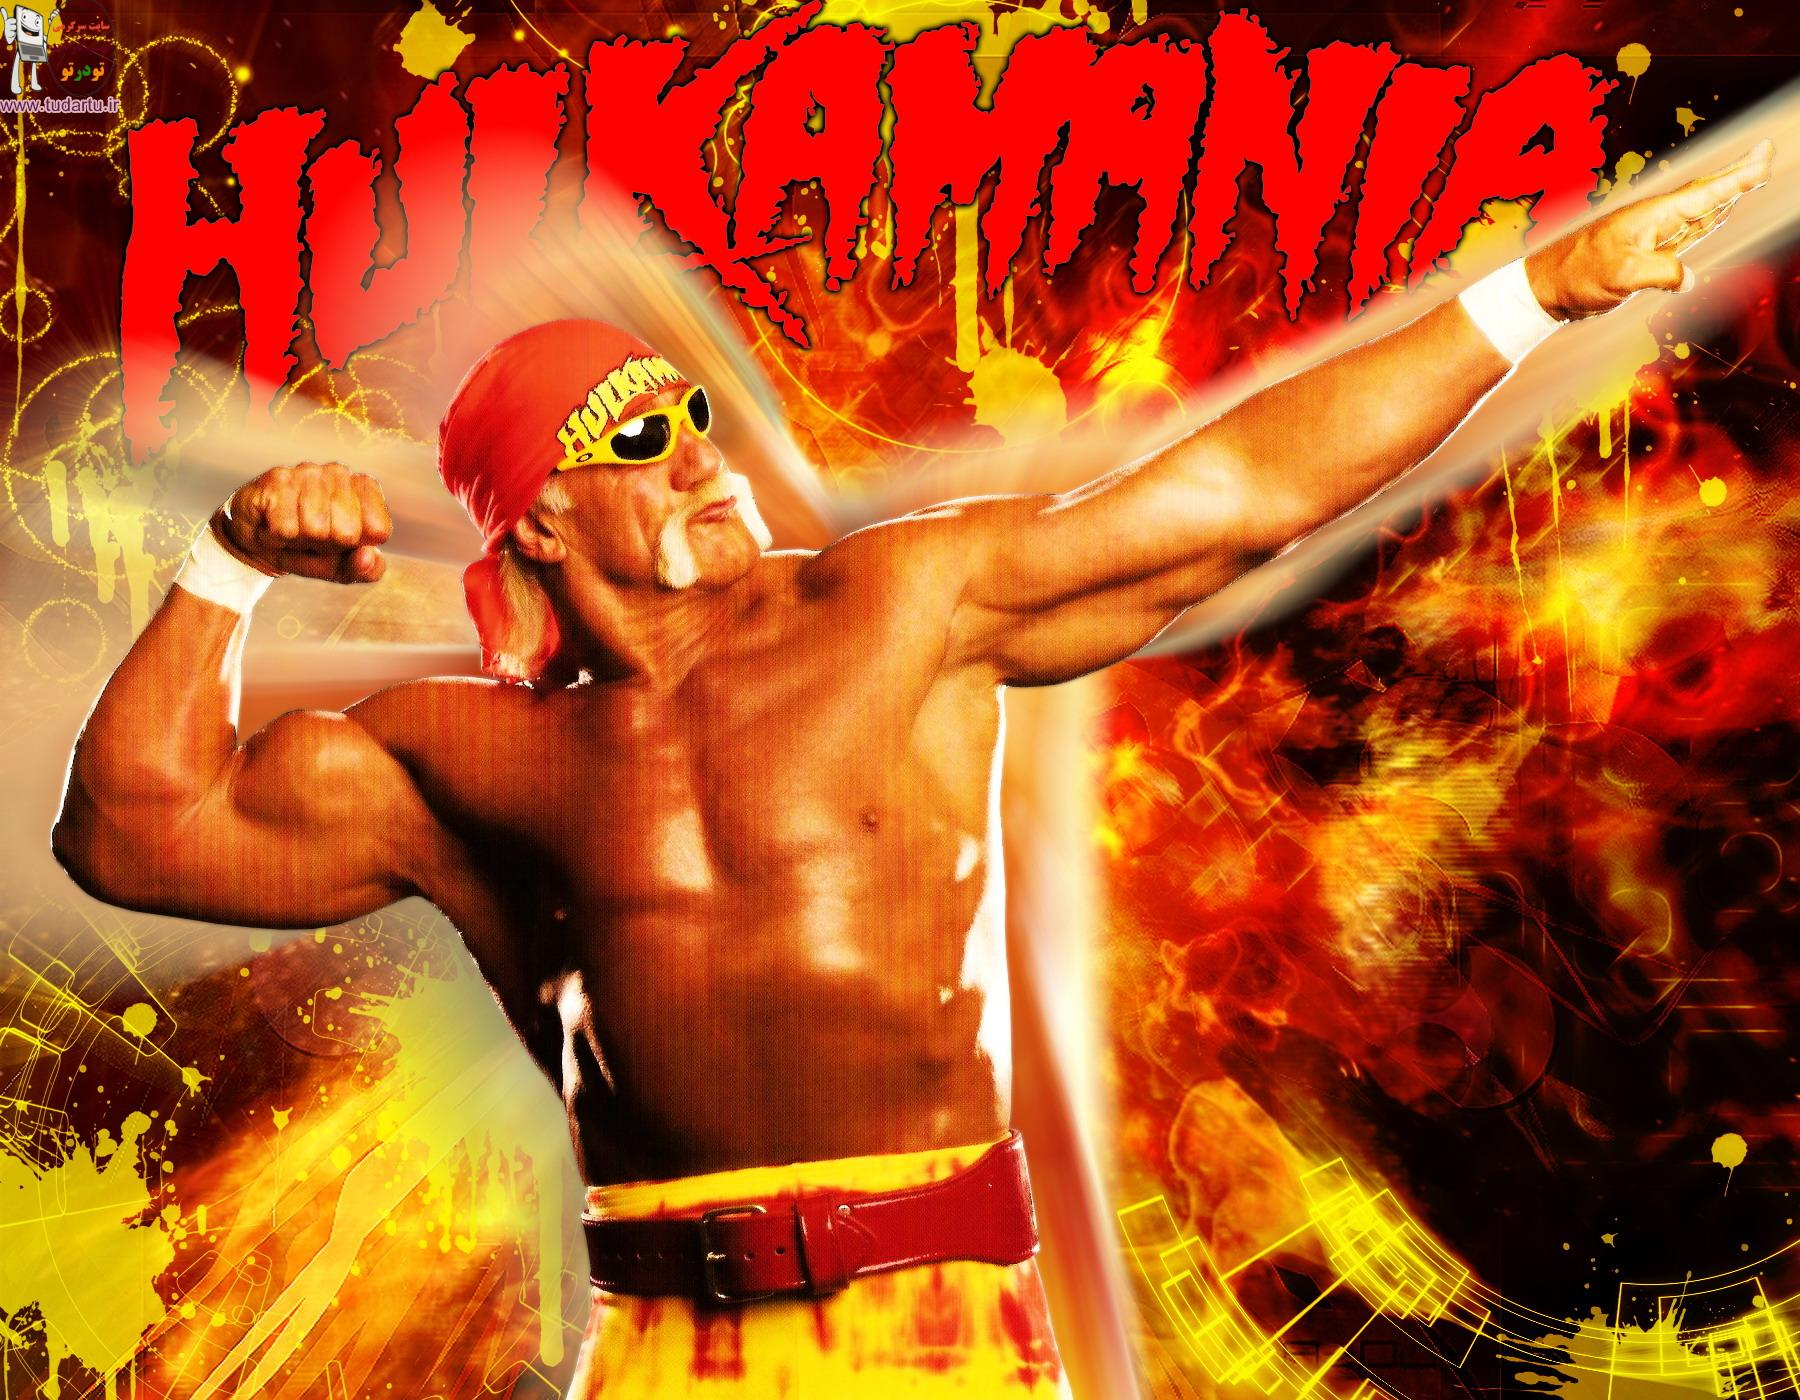 والپیپر زیبا از هالک هوگن | wwe Hulk Hogan